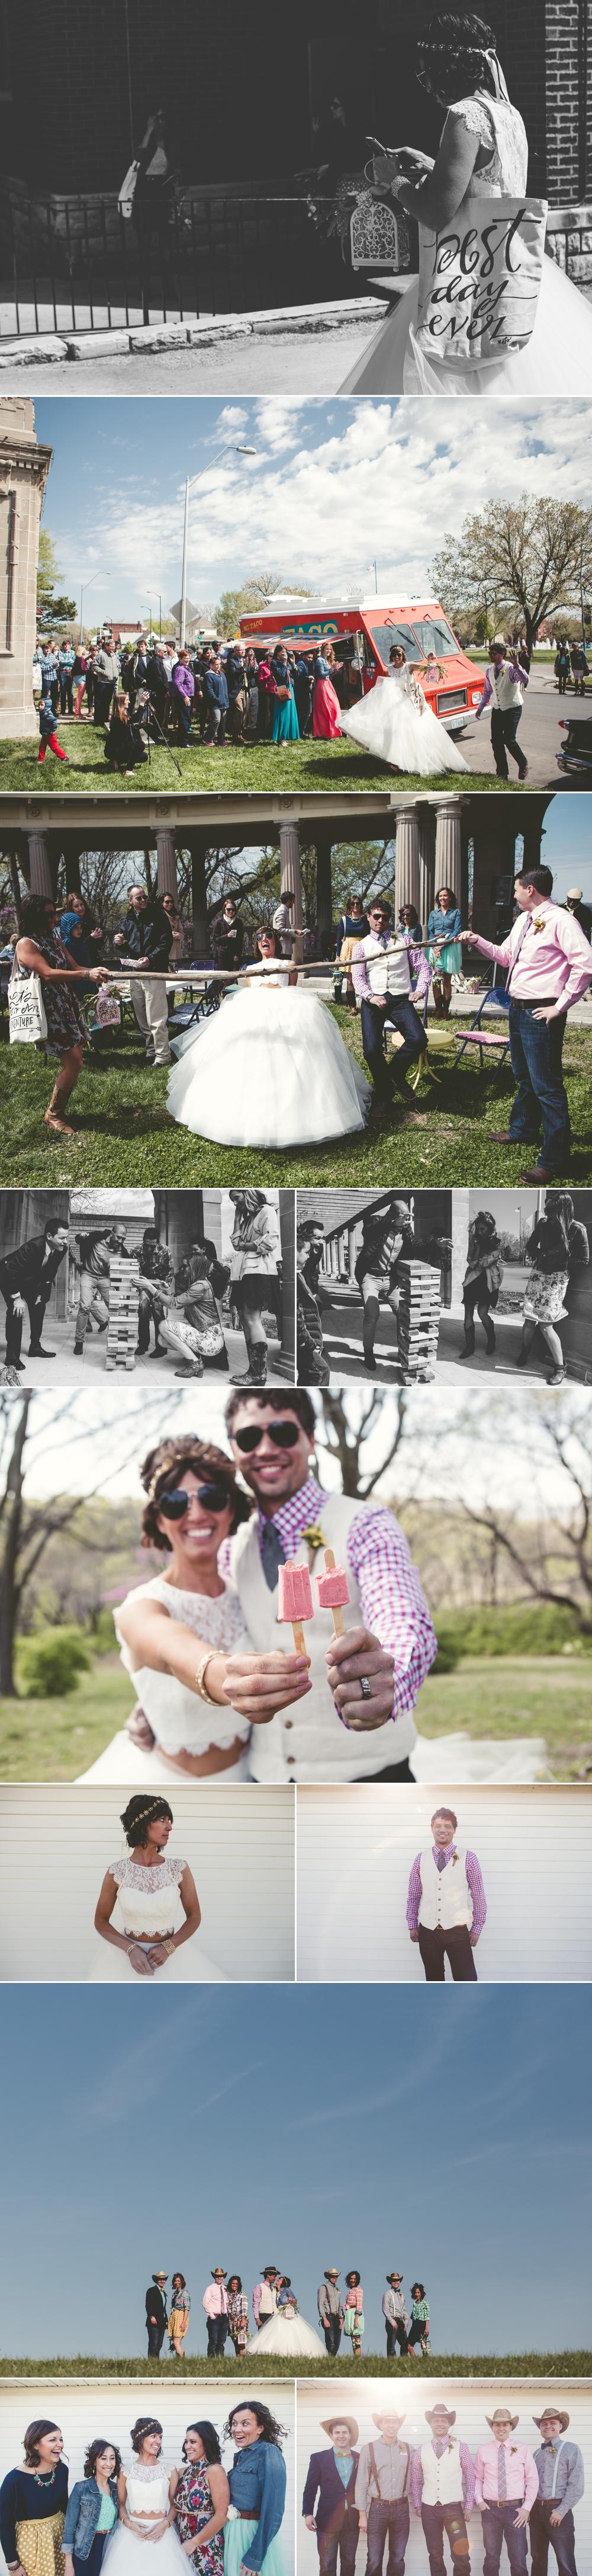 jason_domingues_photography_best_wedding_photographer_kansas_city_kc_downtown_historic_northeast_city_country_farm_diy_creative_details_3